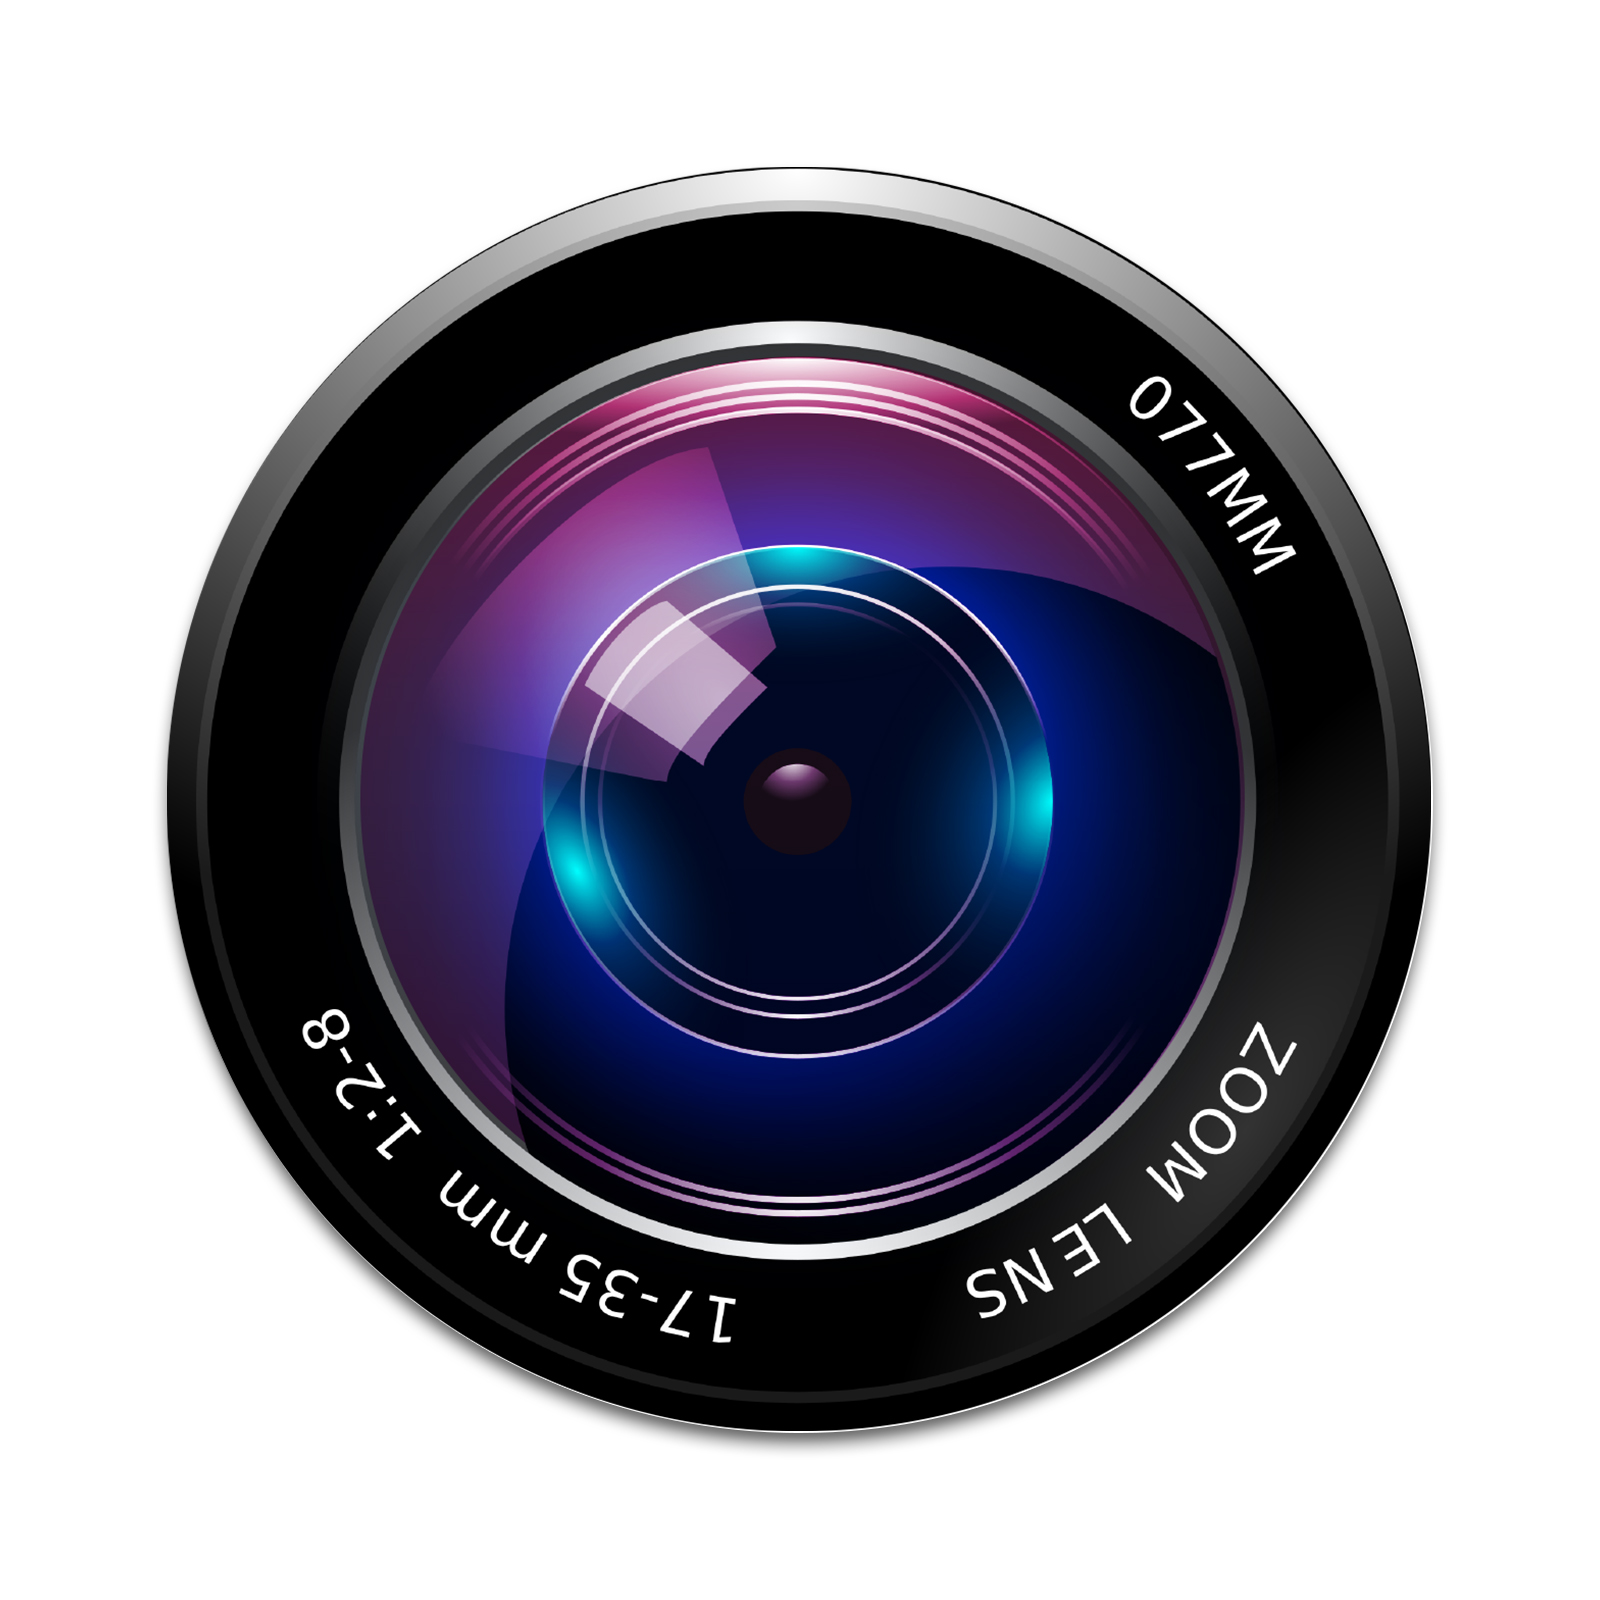 Camera Lens 2 Sticker Set for Pop Grip Stent for Phones ...